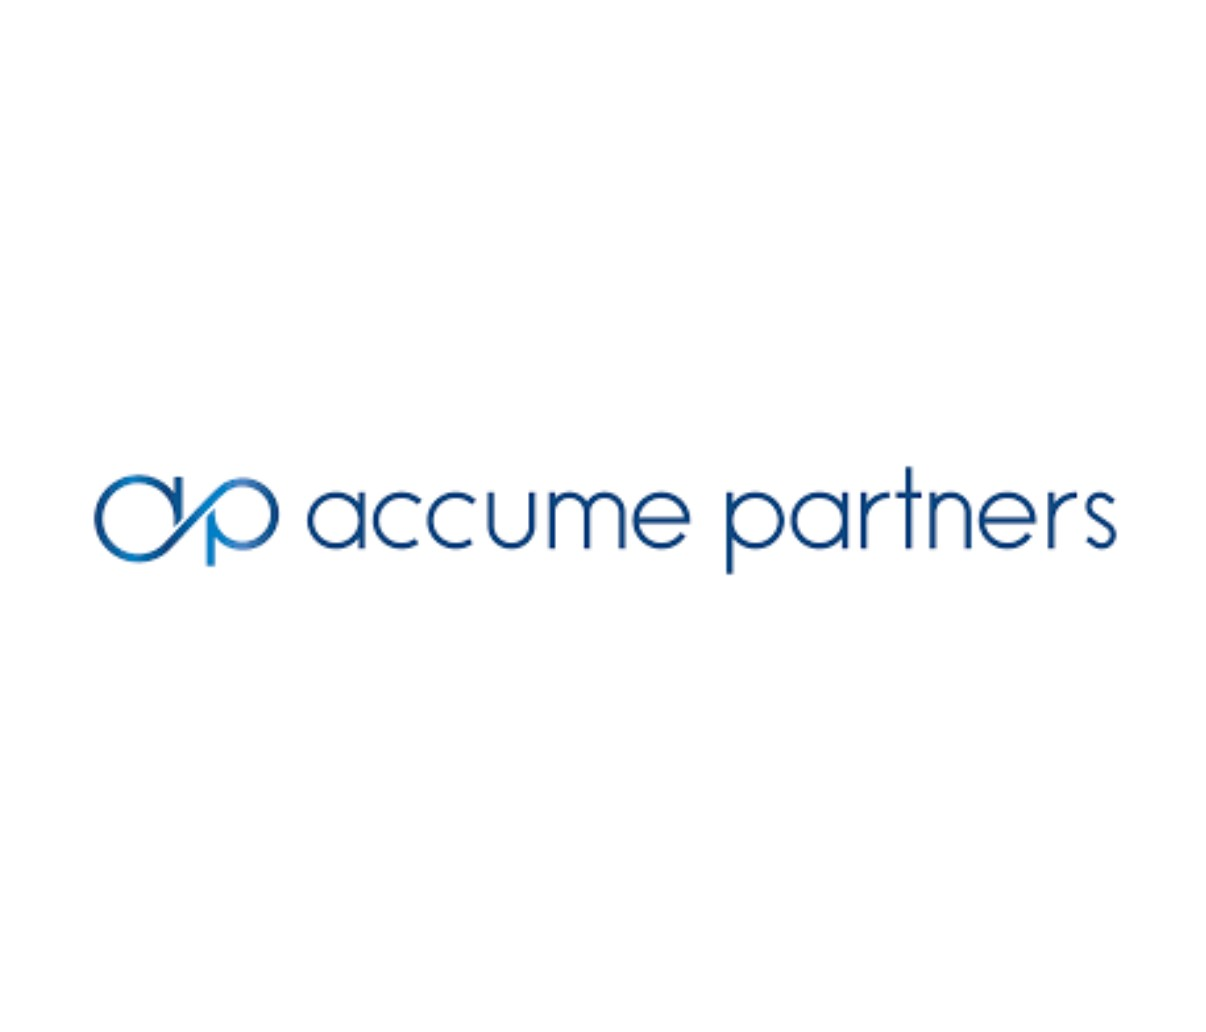 AccumePartners-Logo-ConventionSponsor-Reel-1